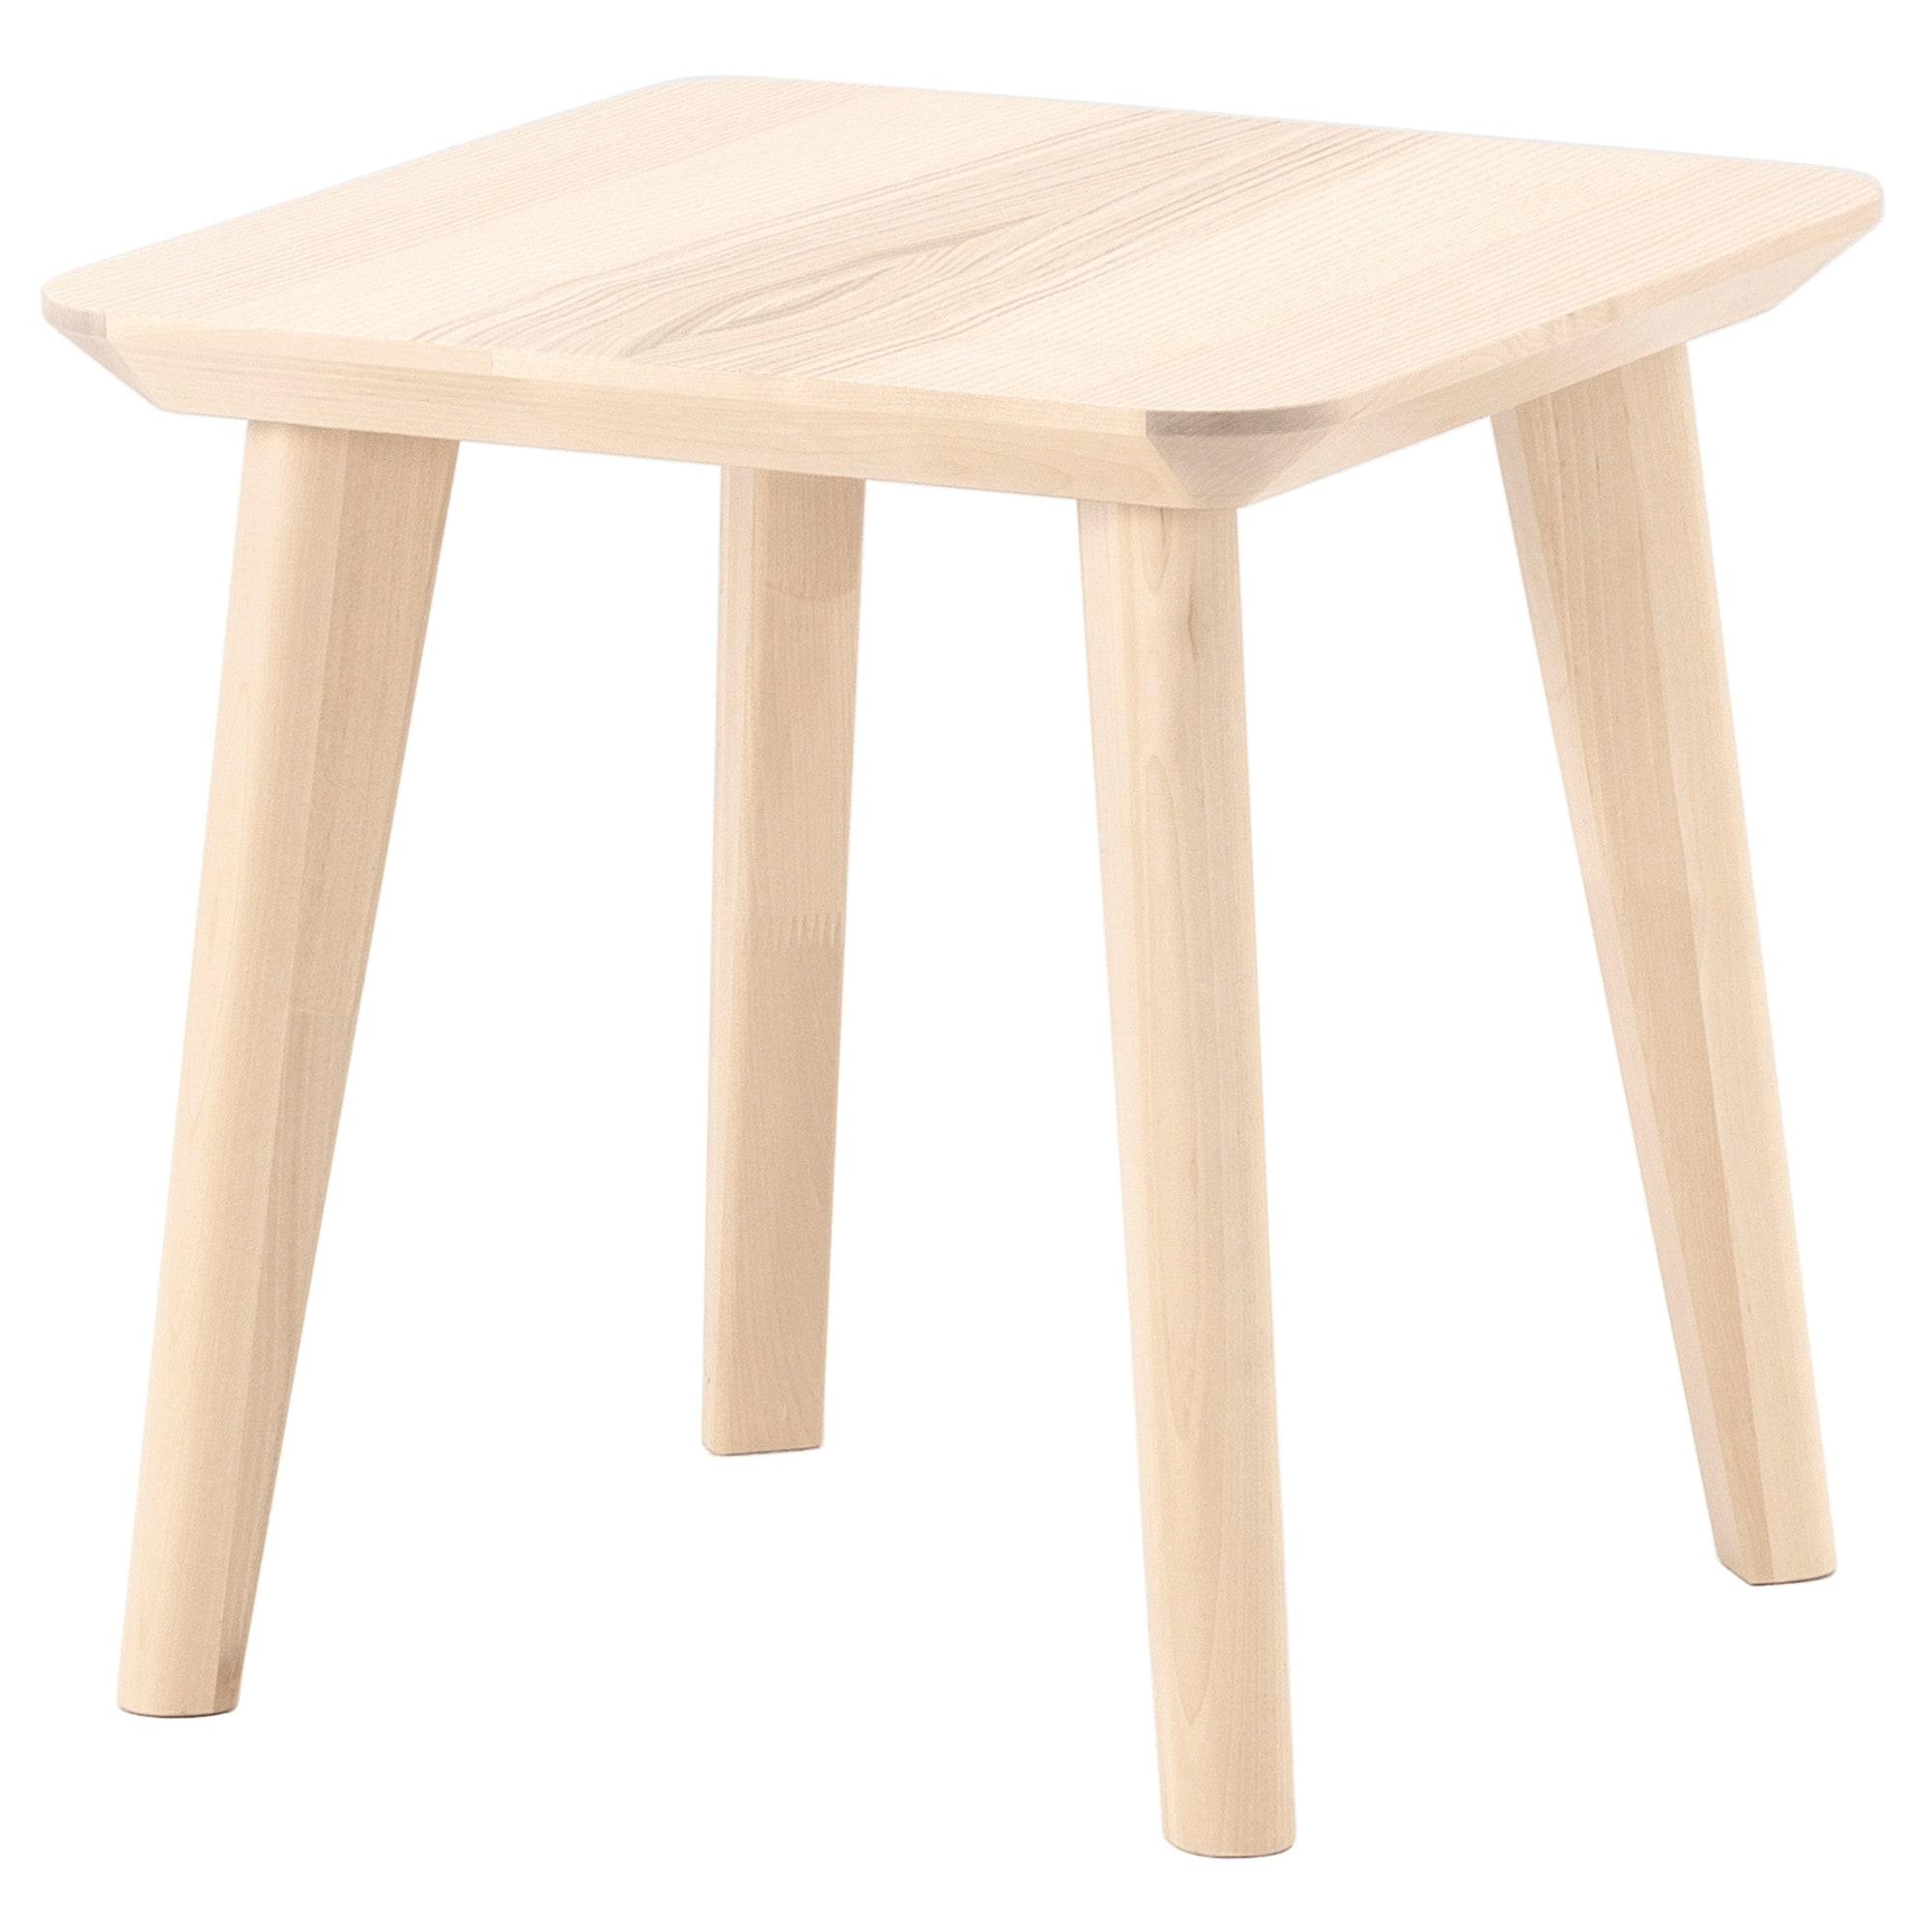 Lisabo Side Table Ash Veneer 17 3 4x17 3 4 Ikea Side Table Ikea Ikea Coffee Table [ 2000 x 2000 Pixel ]